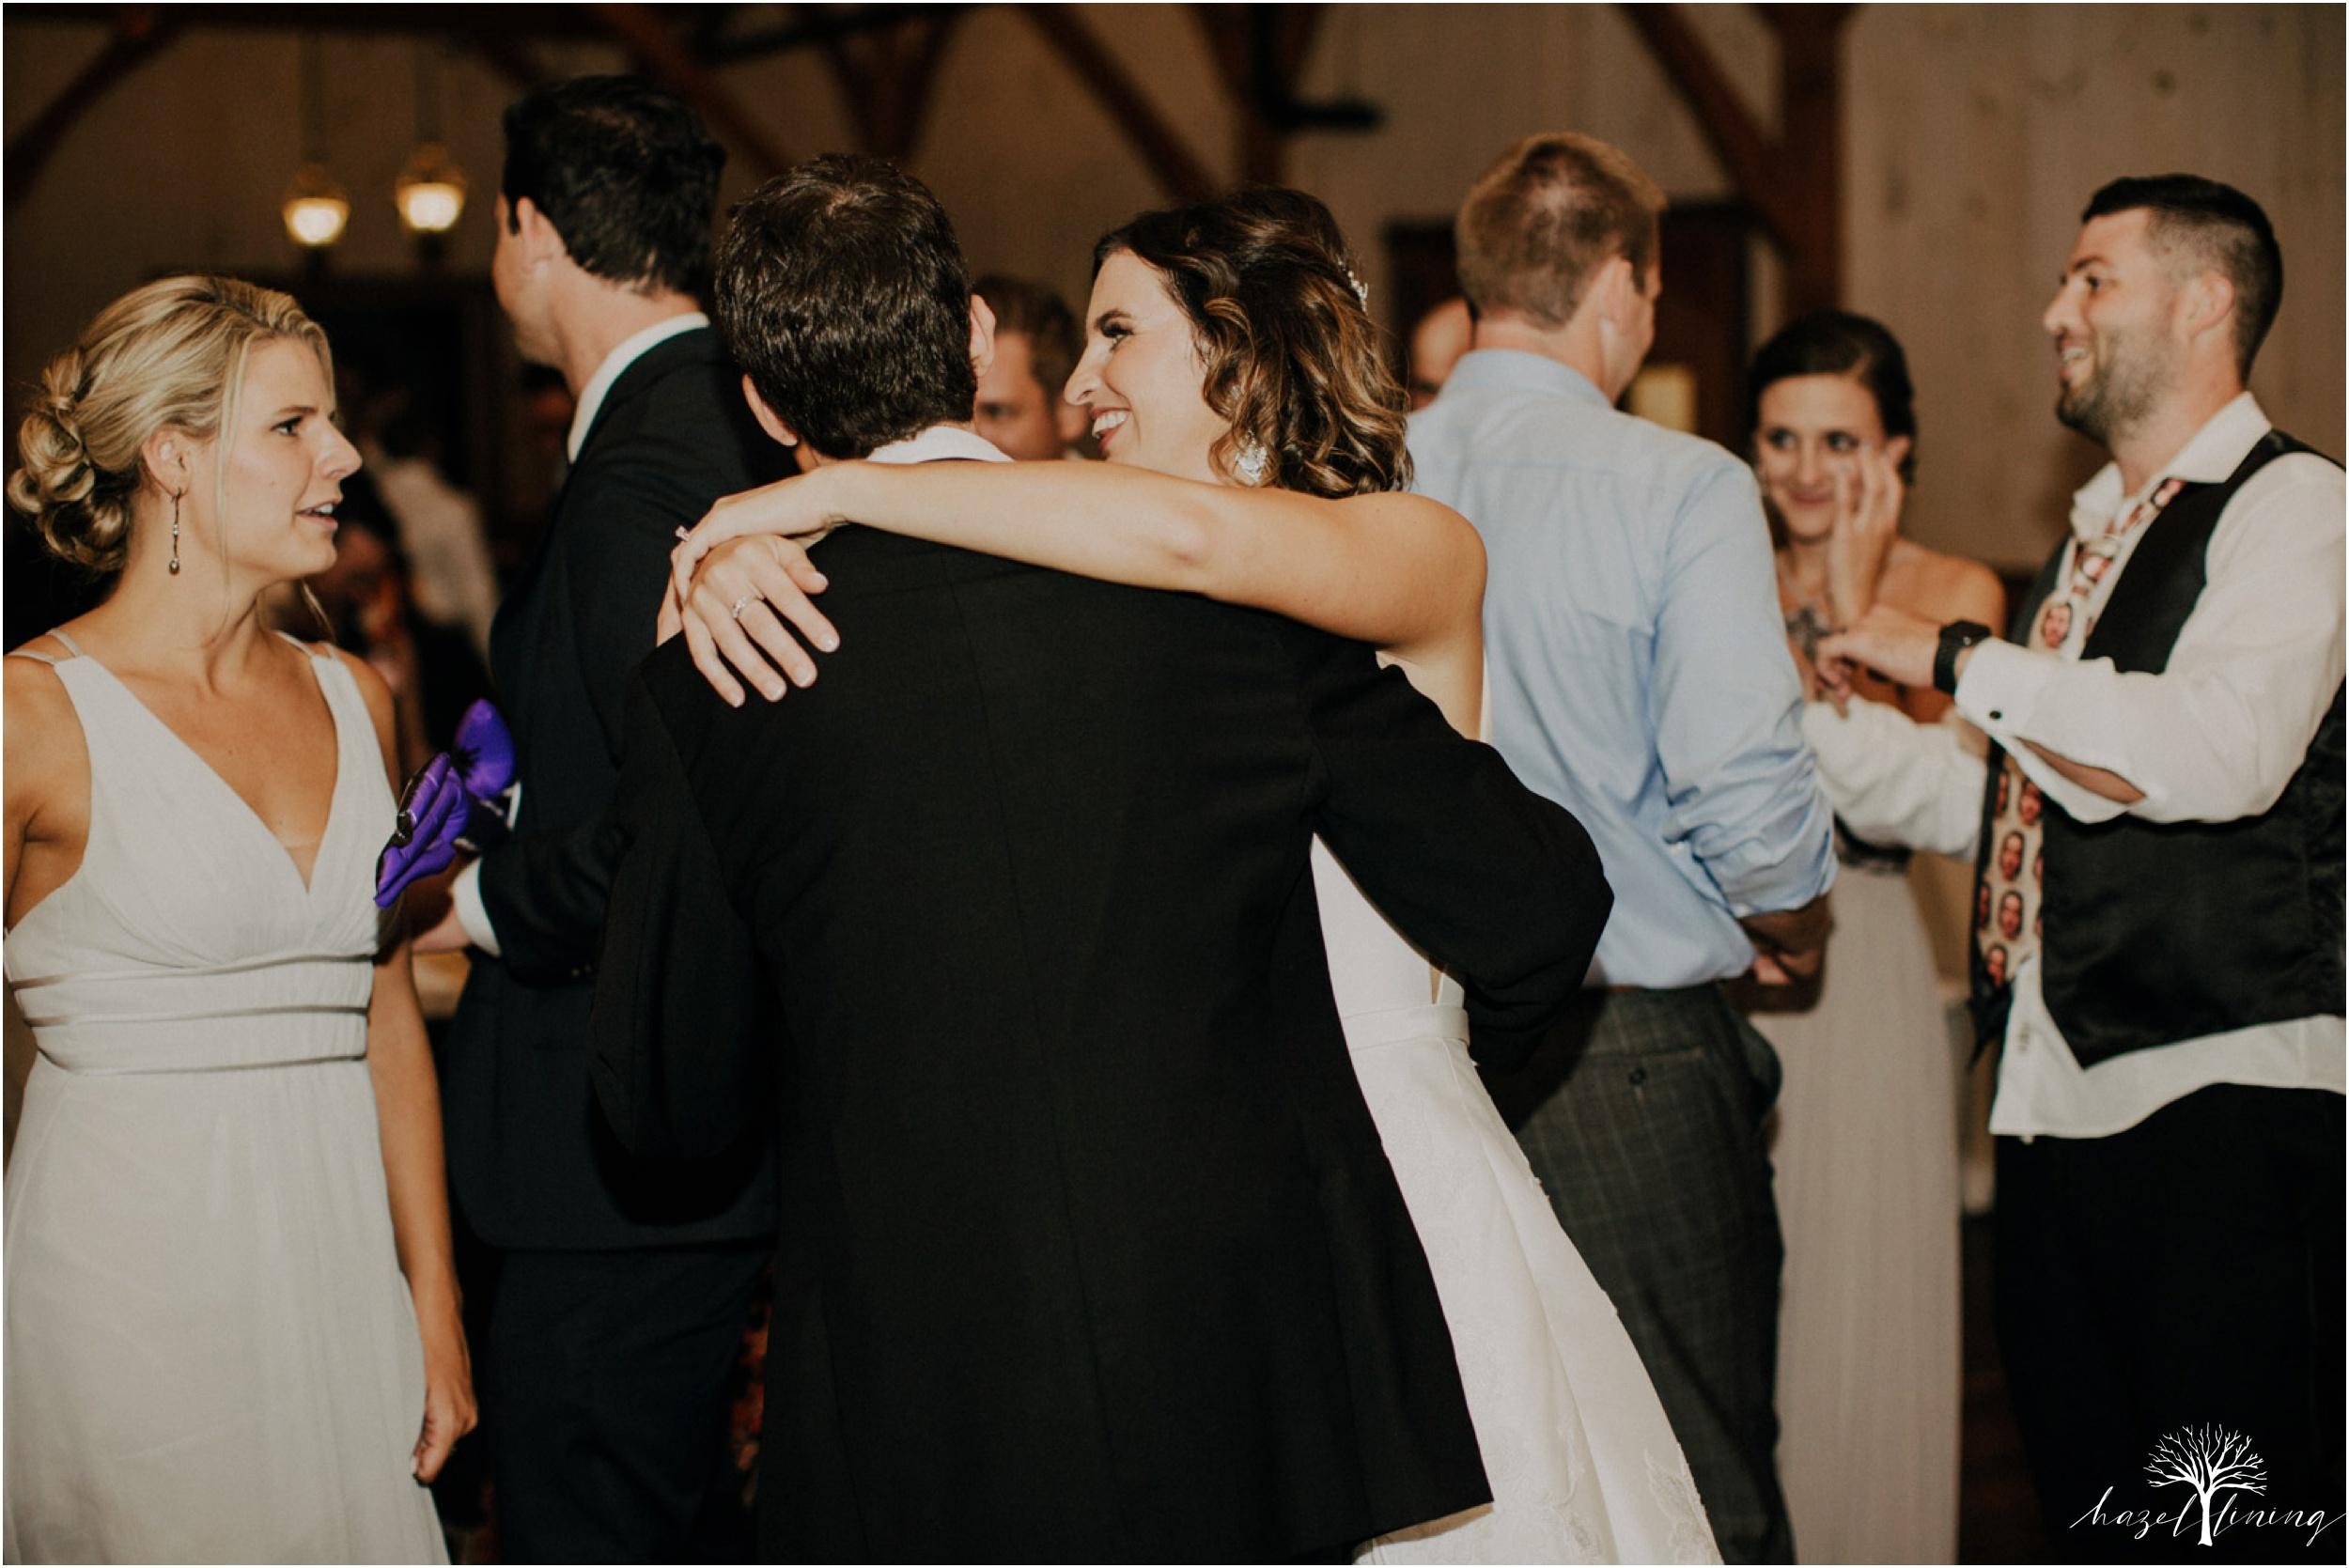 maureen-hepner-anthony-giordano-rose-bank-winery-newtow-pennsylvania-luxury-summer-wedding-hazel-lining-photography-destination-elopement-wedding-engagement-photography_0153.jpg